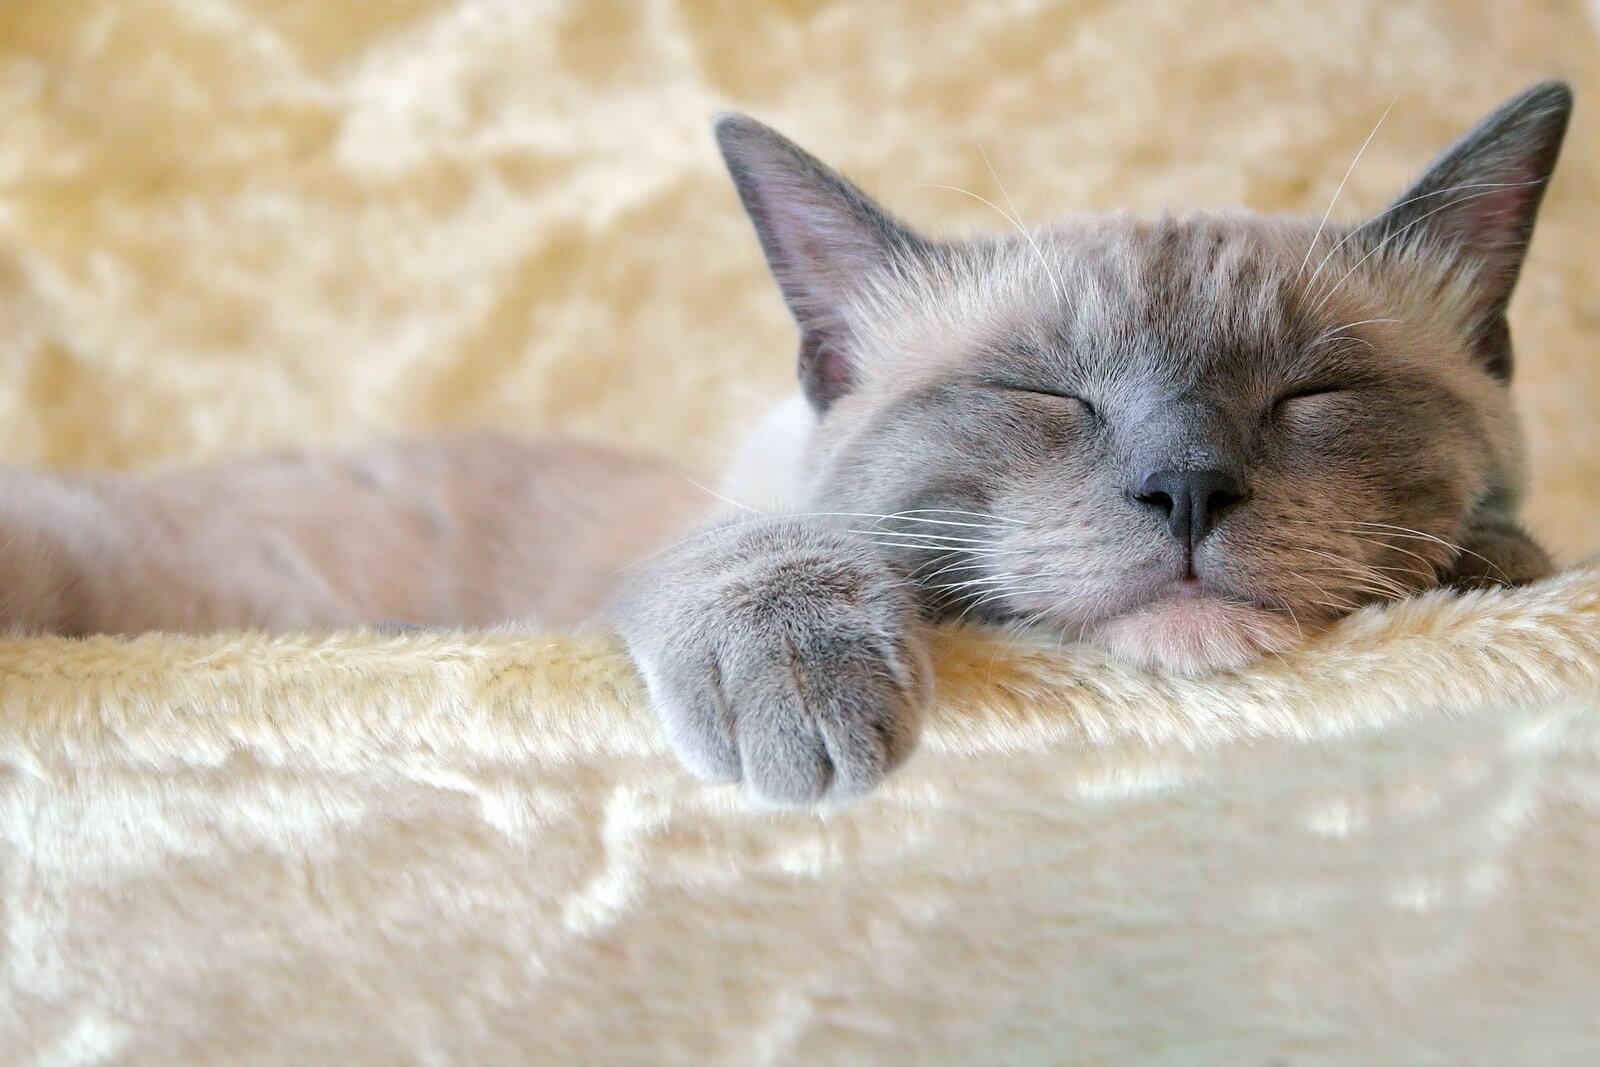 Tanda-tanda Kucing Betina Berhasil Kawin: Kucing Lebih Sering Tidur